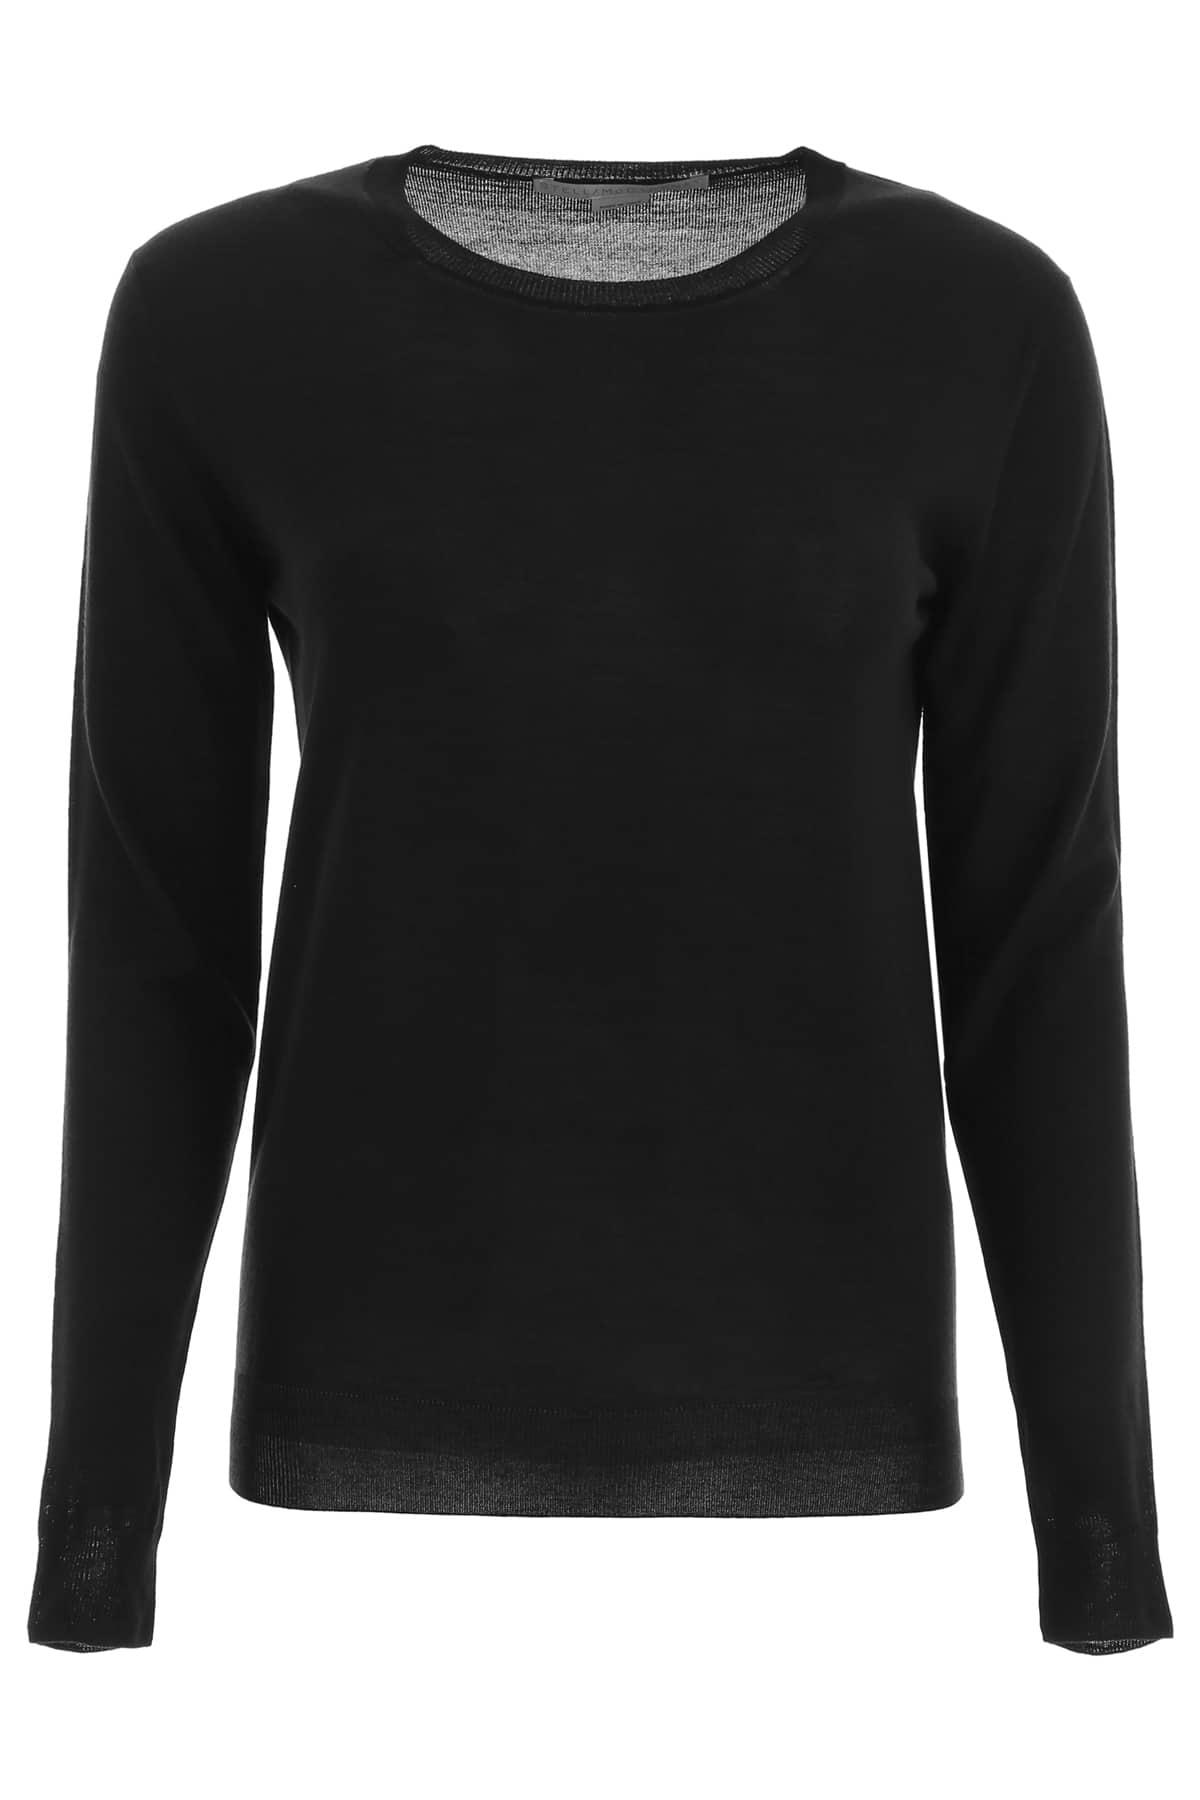 STELLA McCARTNEY CREW NECK PULLOVER 42 Black Wool